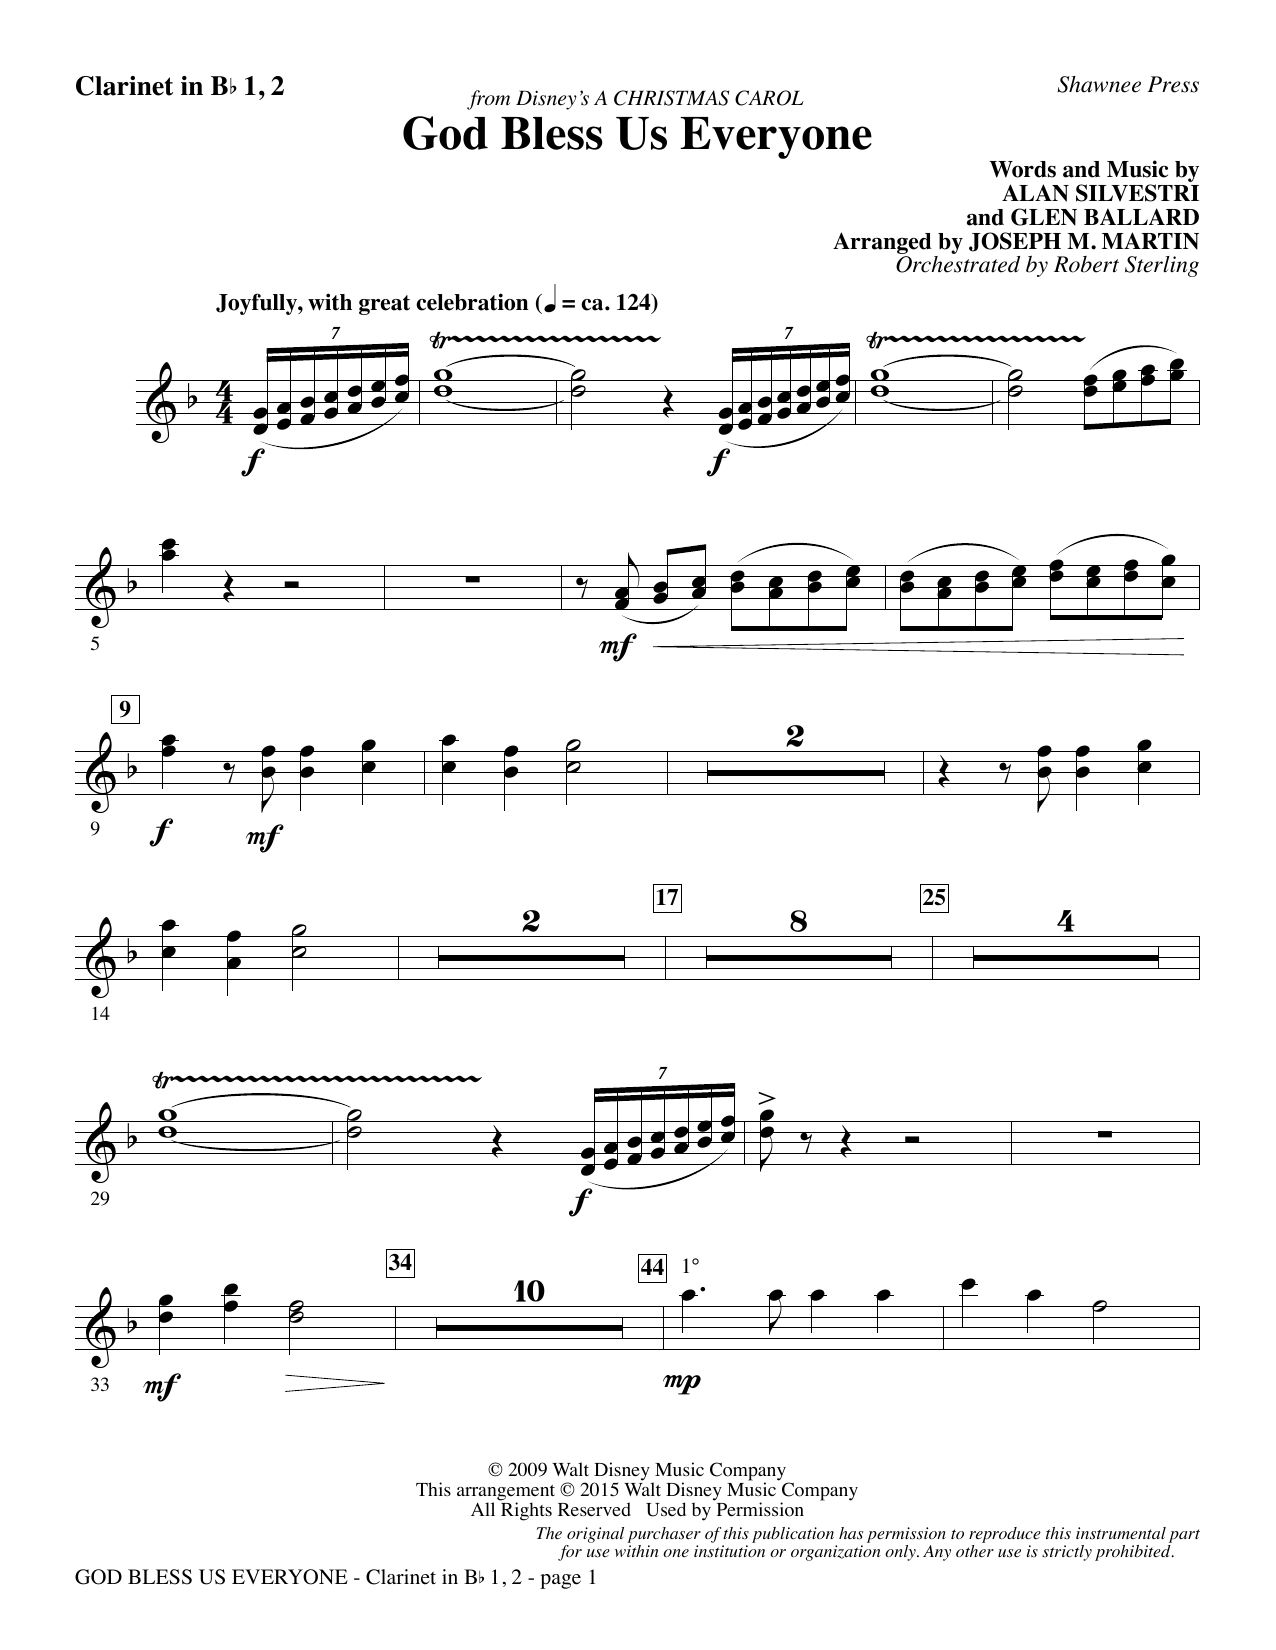 God Bless Us Everyone (from Disney's A Christmas Carol) - Bb Clarinet 1 & 2 sheet music